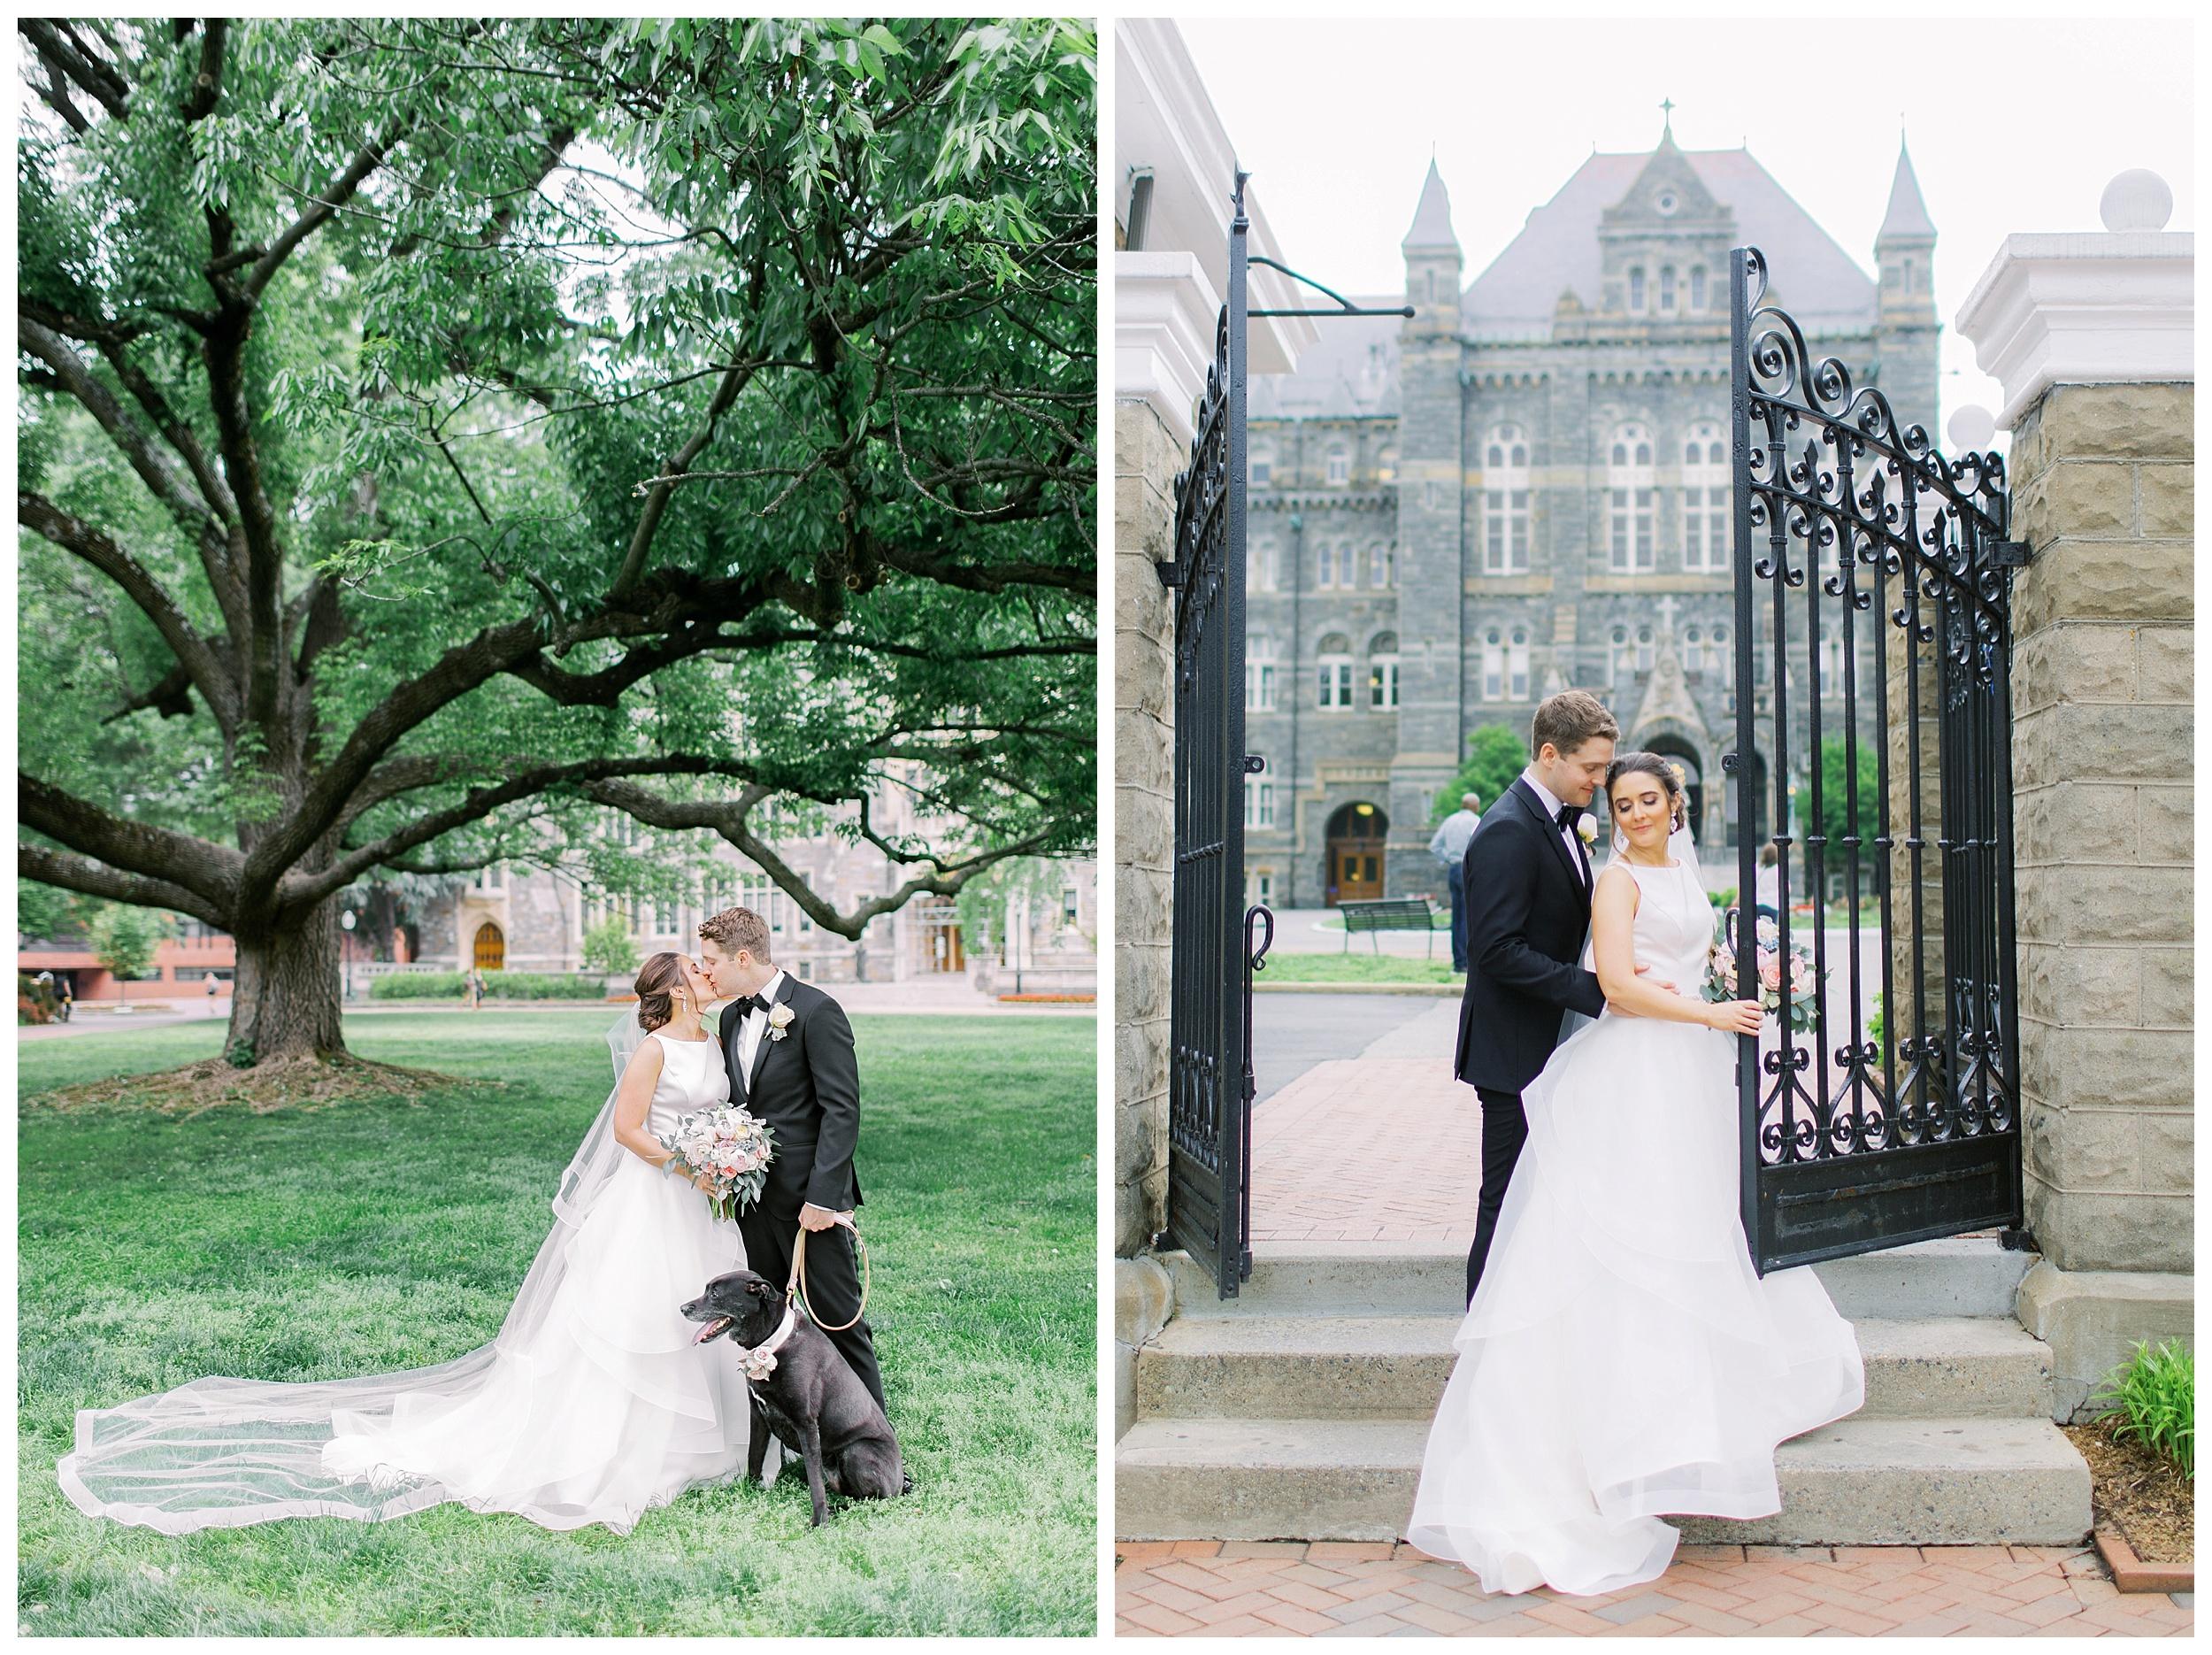 DAR Constitution Hall Wedding Wedding | Daughters of the American Revolution Wedding | District of Columbia Film Wedding Photographer Kir Tuben_0063.jpg